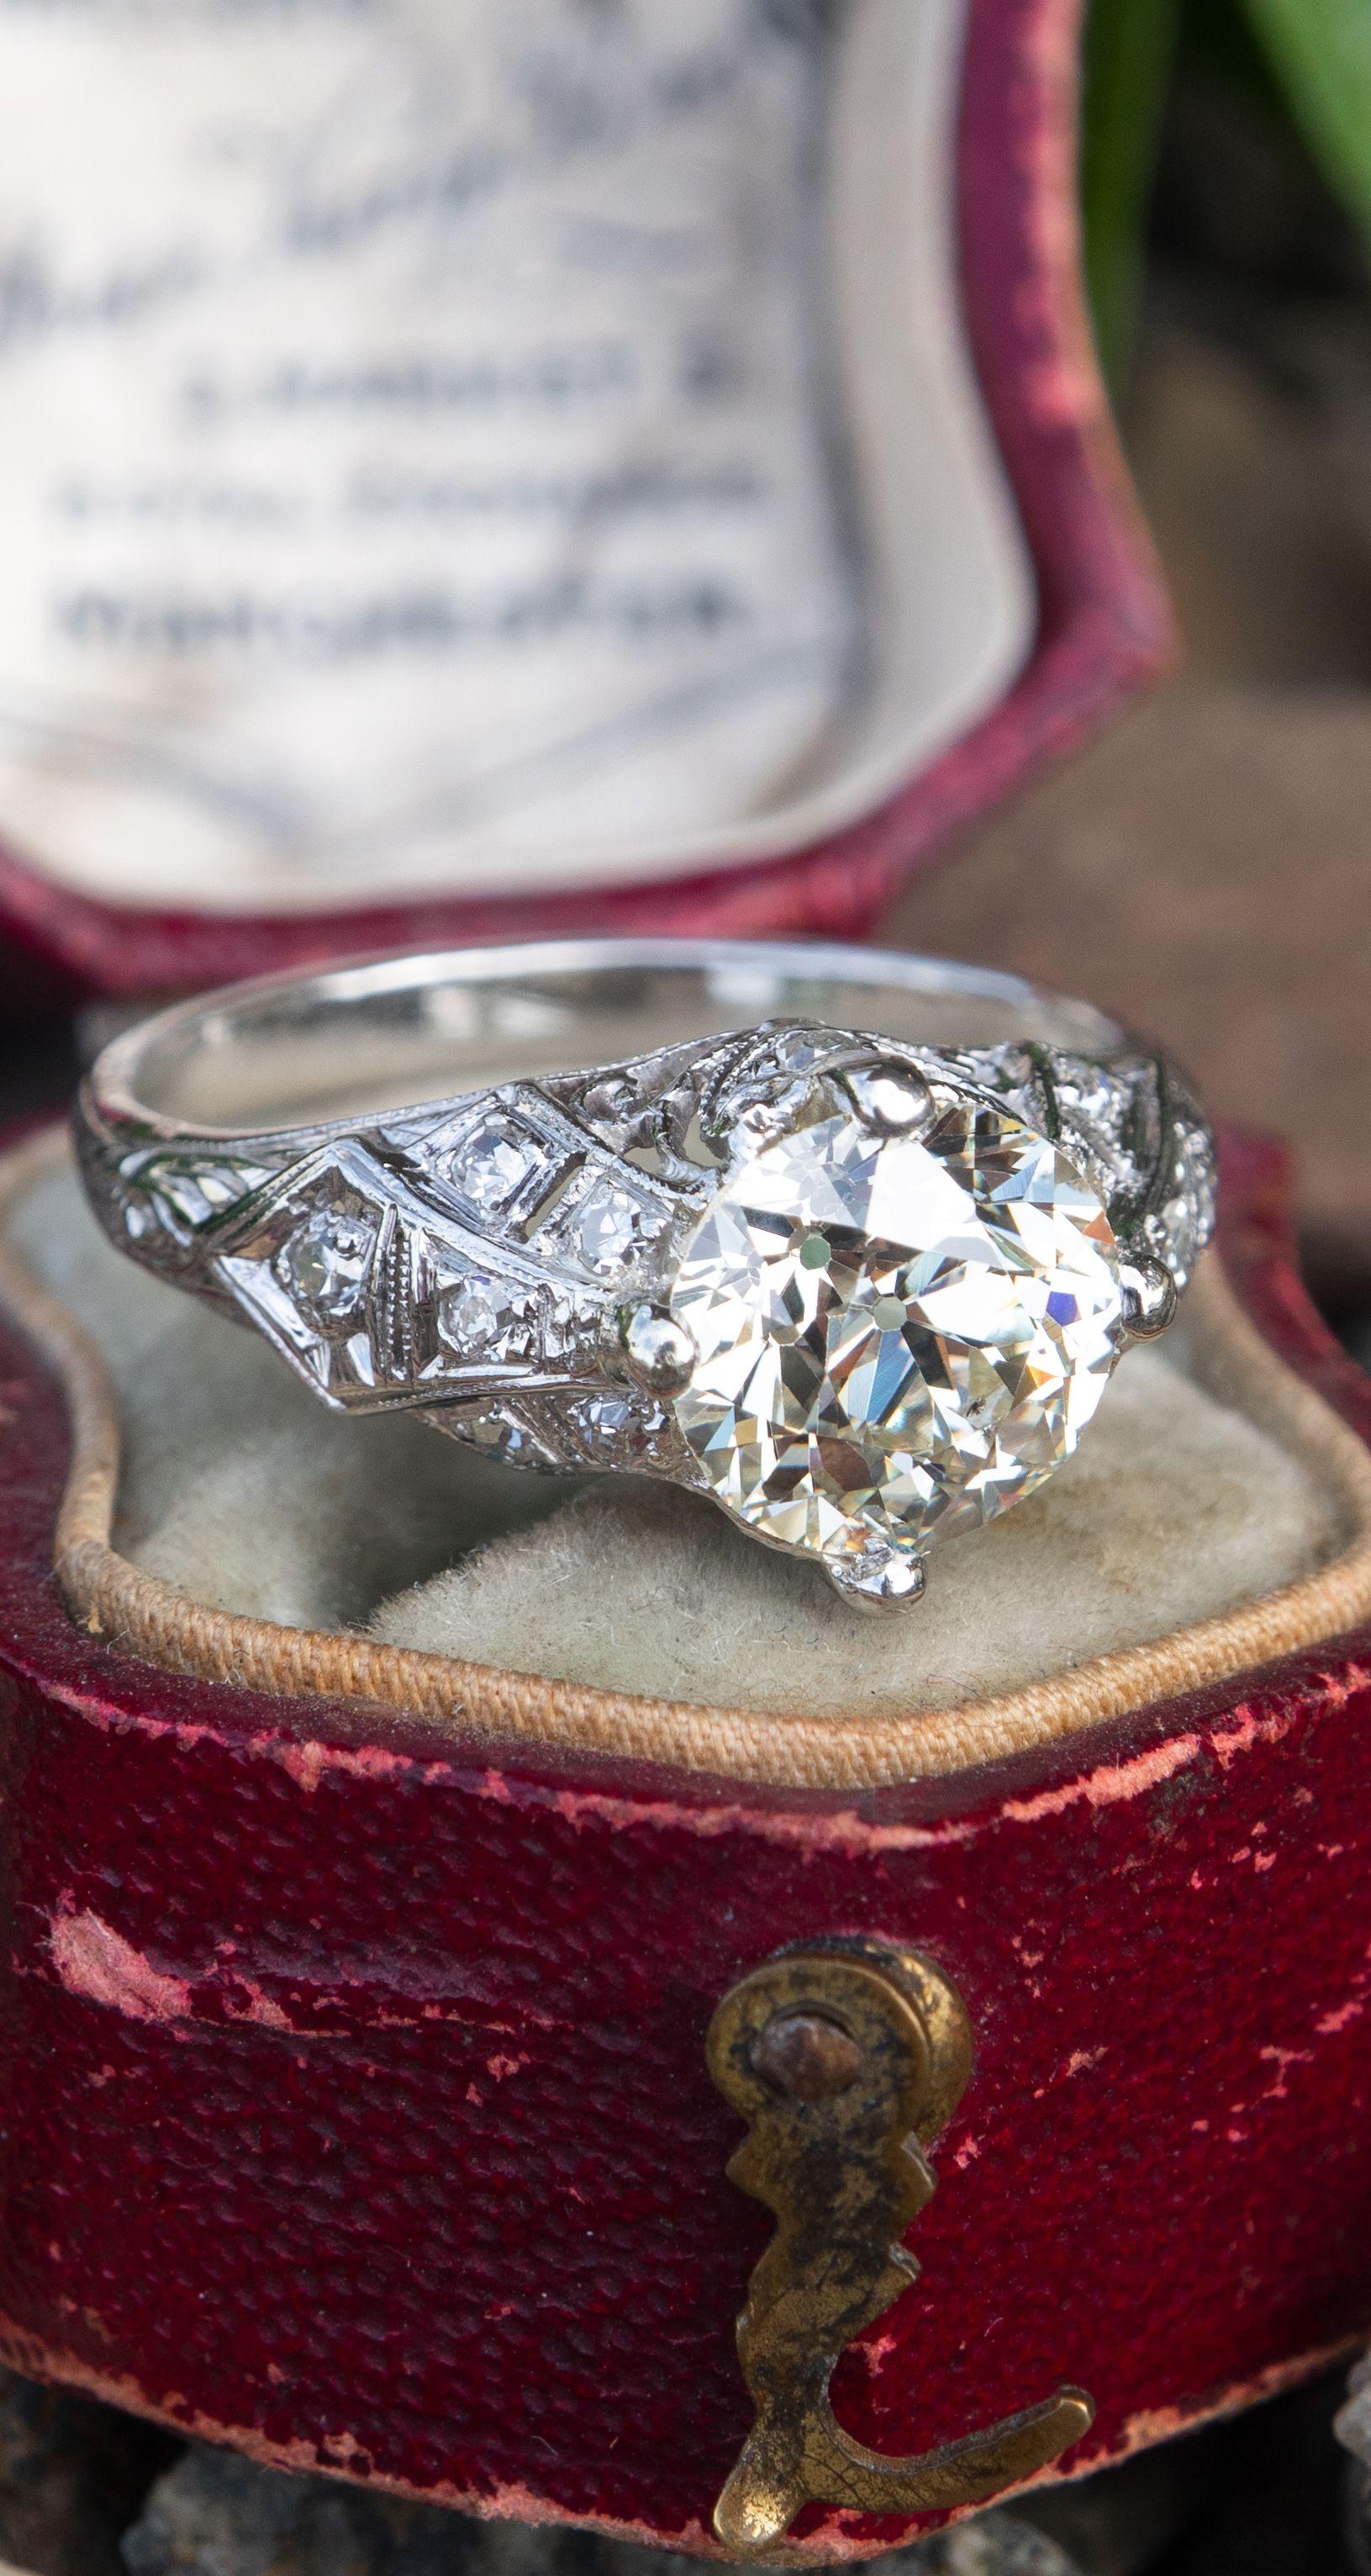 fd0d182e6e2c Filigree Art Deco Engagement Ring Old Euro Diamond GIA Cert Bijouterie